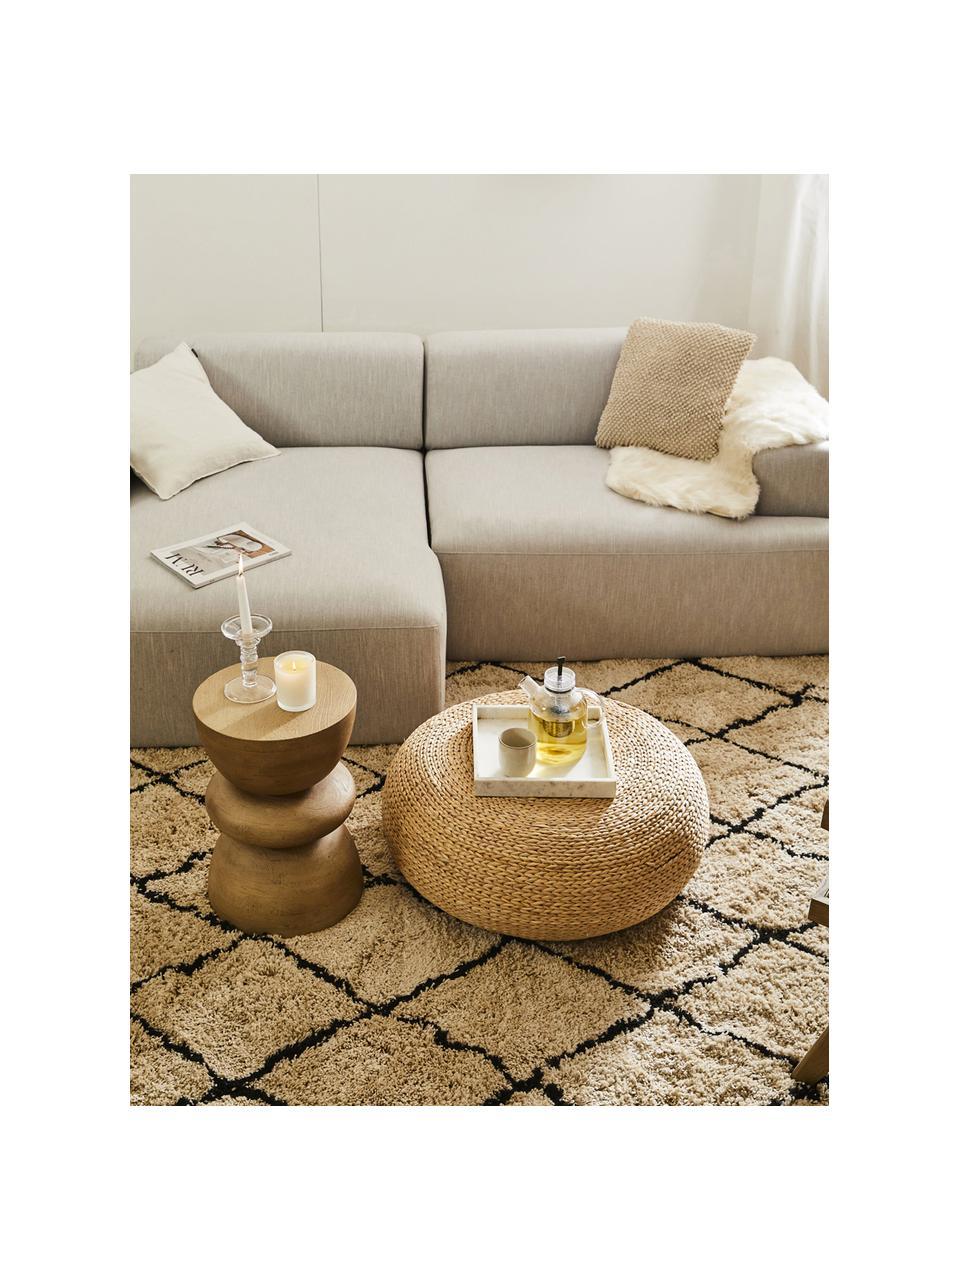 Ribfluwelen hoekbank Melva (3-zits) in beige, Bekleding: corduroy (92% polyester, , Frame: massief grenenhout, FSC-g, Poten: kunststof, Corduroy beige, B 239 x D 143 cm